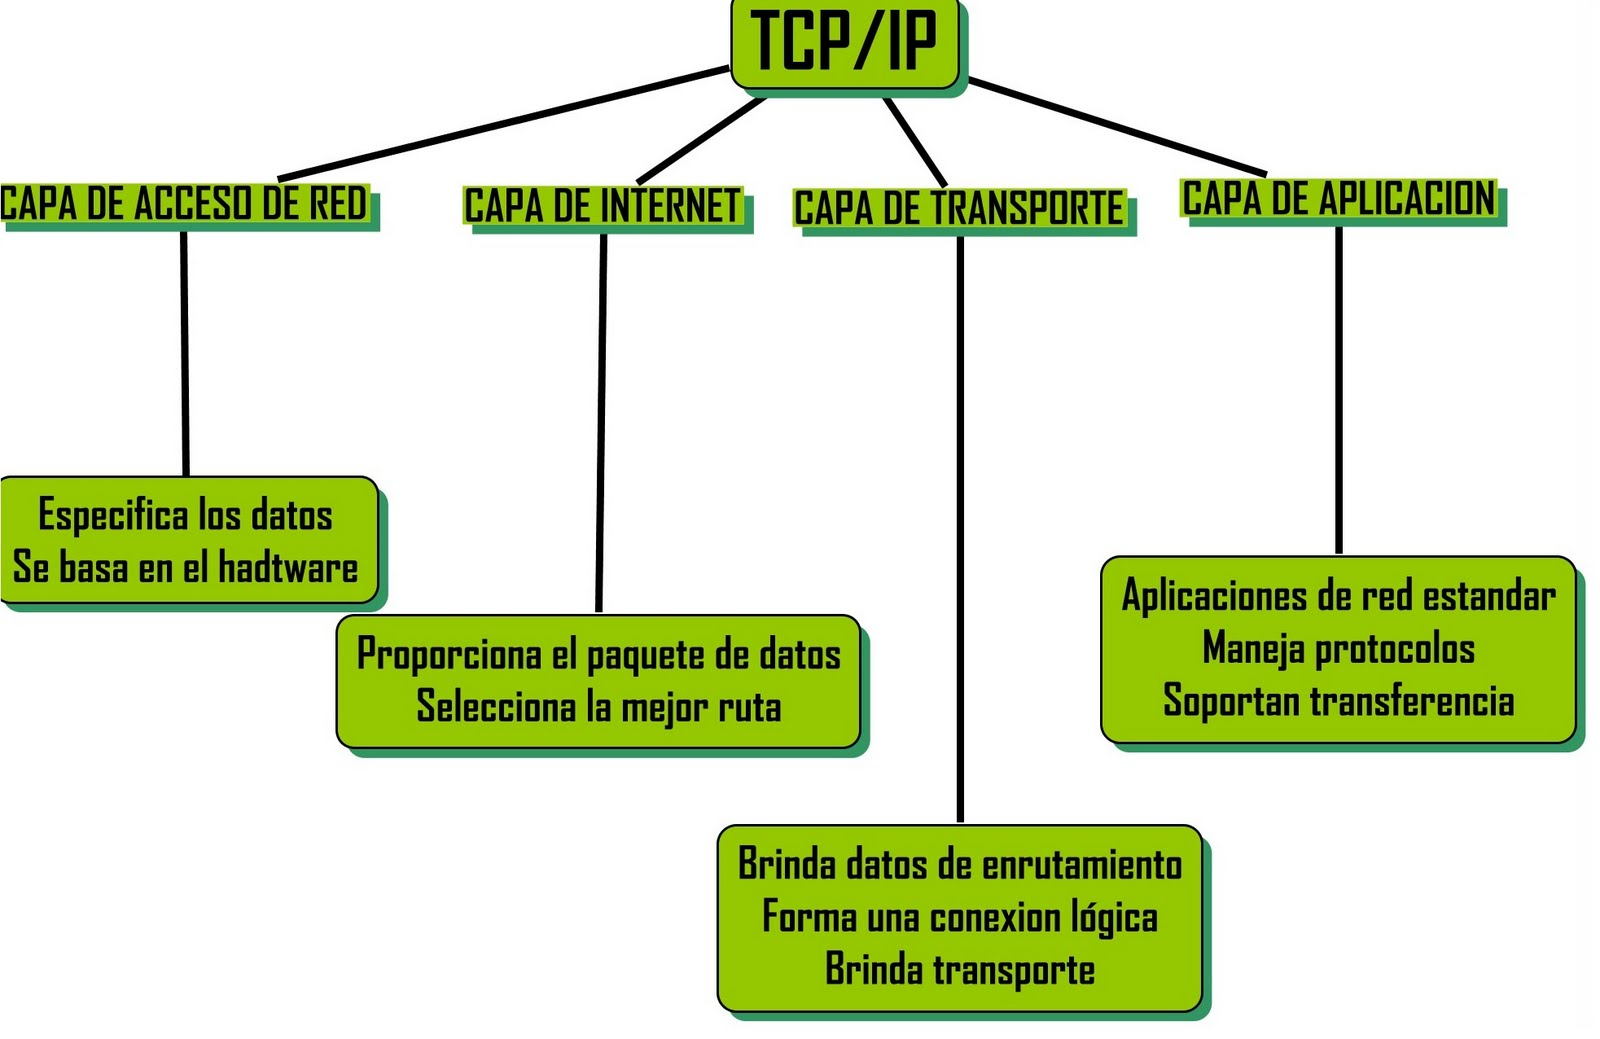 capas de tcp ip: